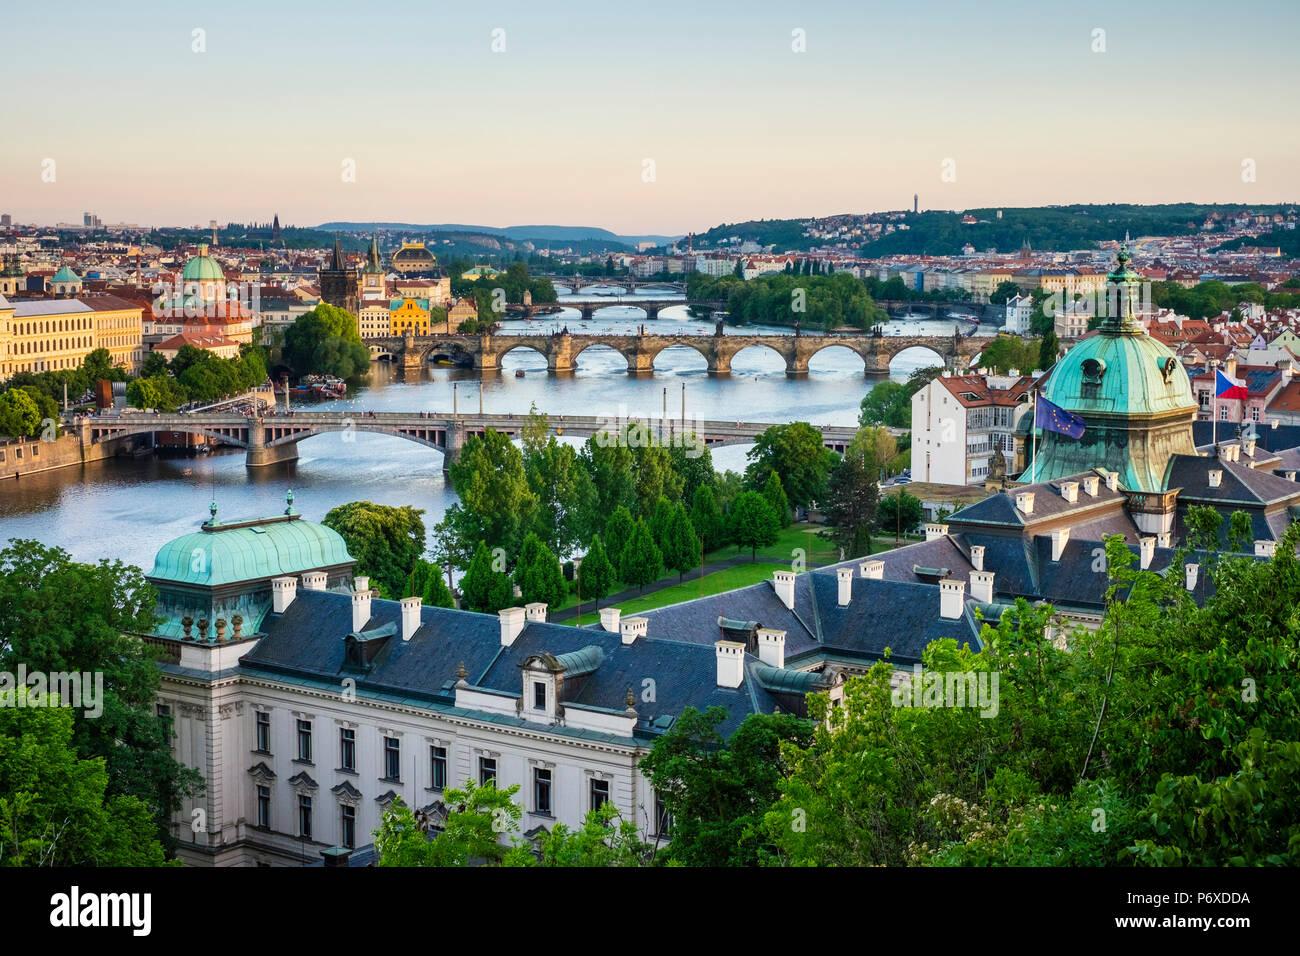 Czech Republic, Prague. View of Prague on the Vltava River from Letna Park, on Letna Hill. Stock Photo